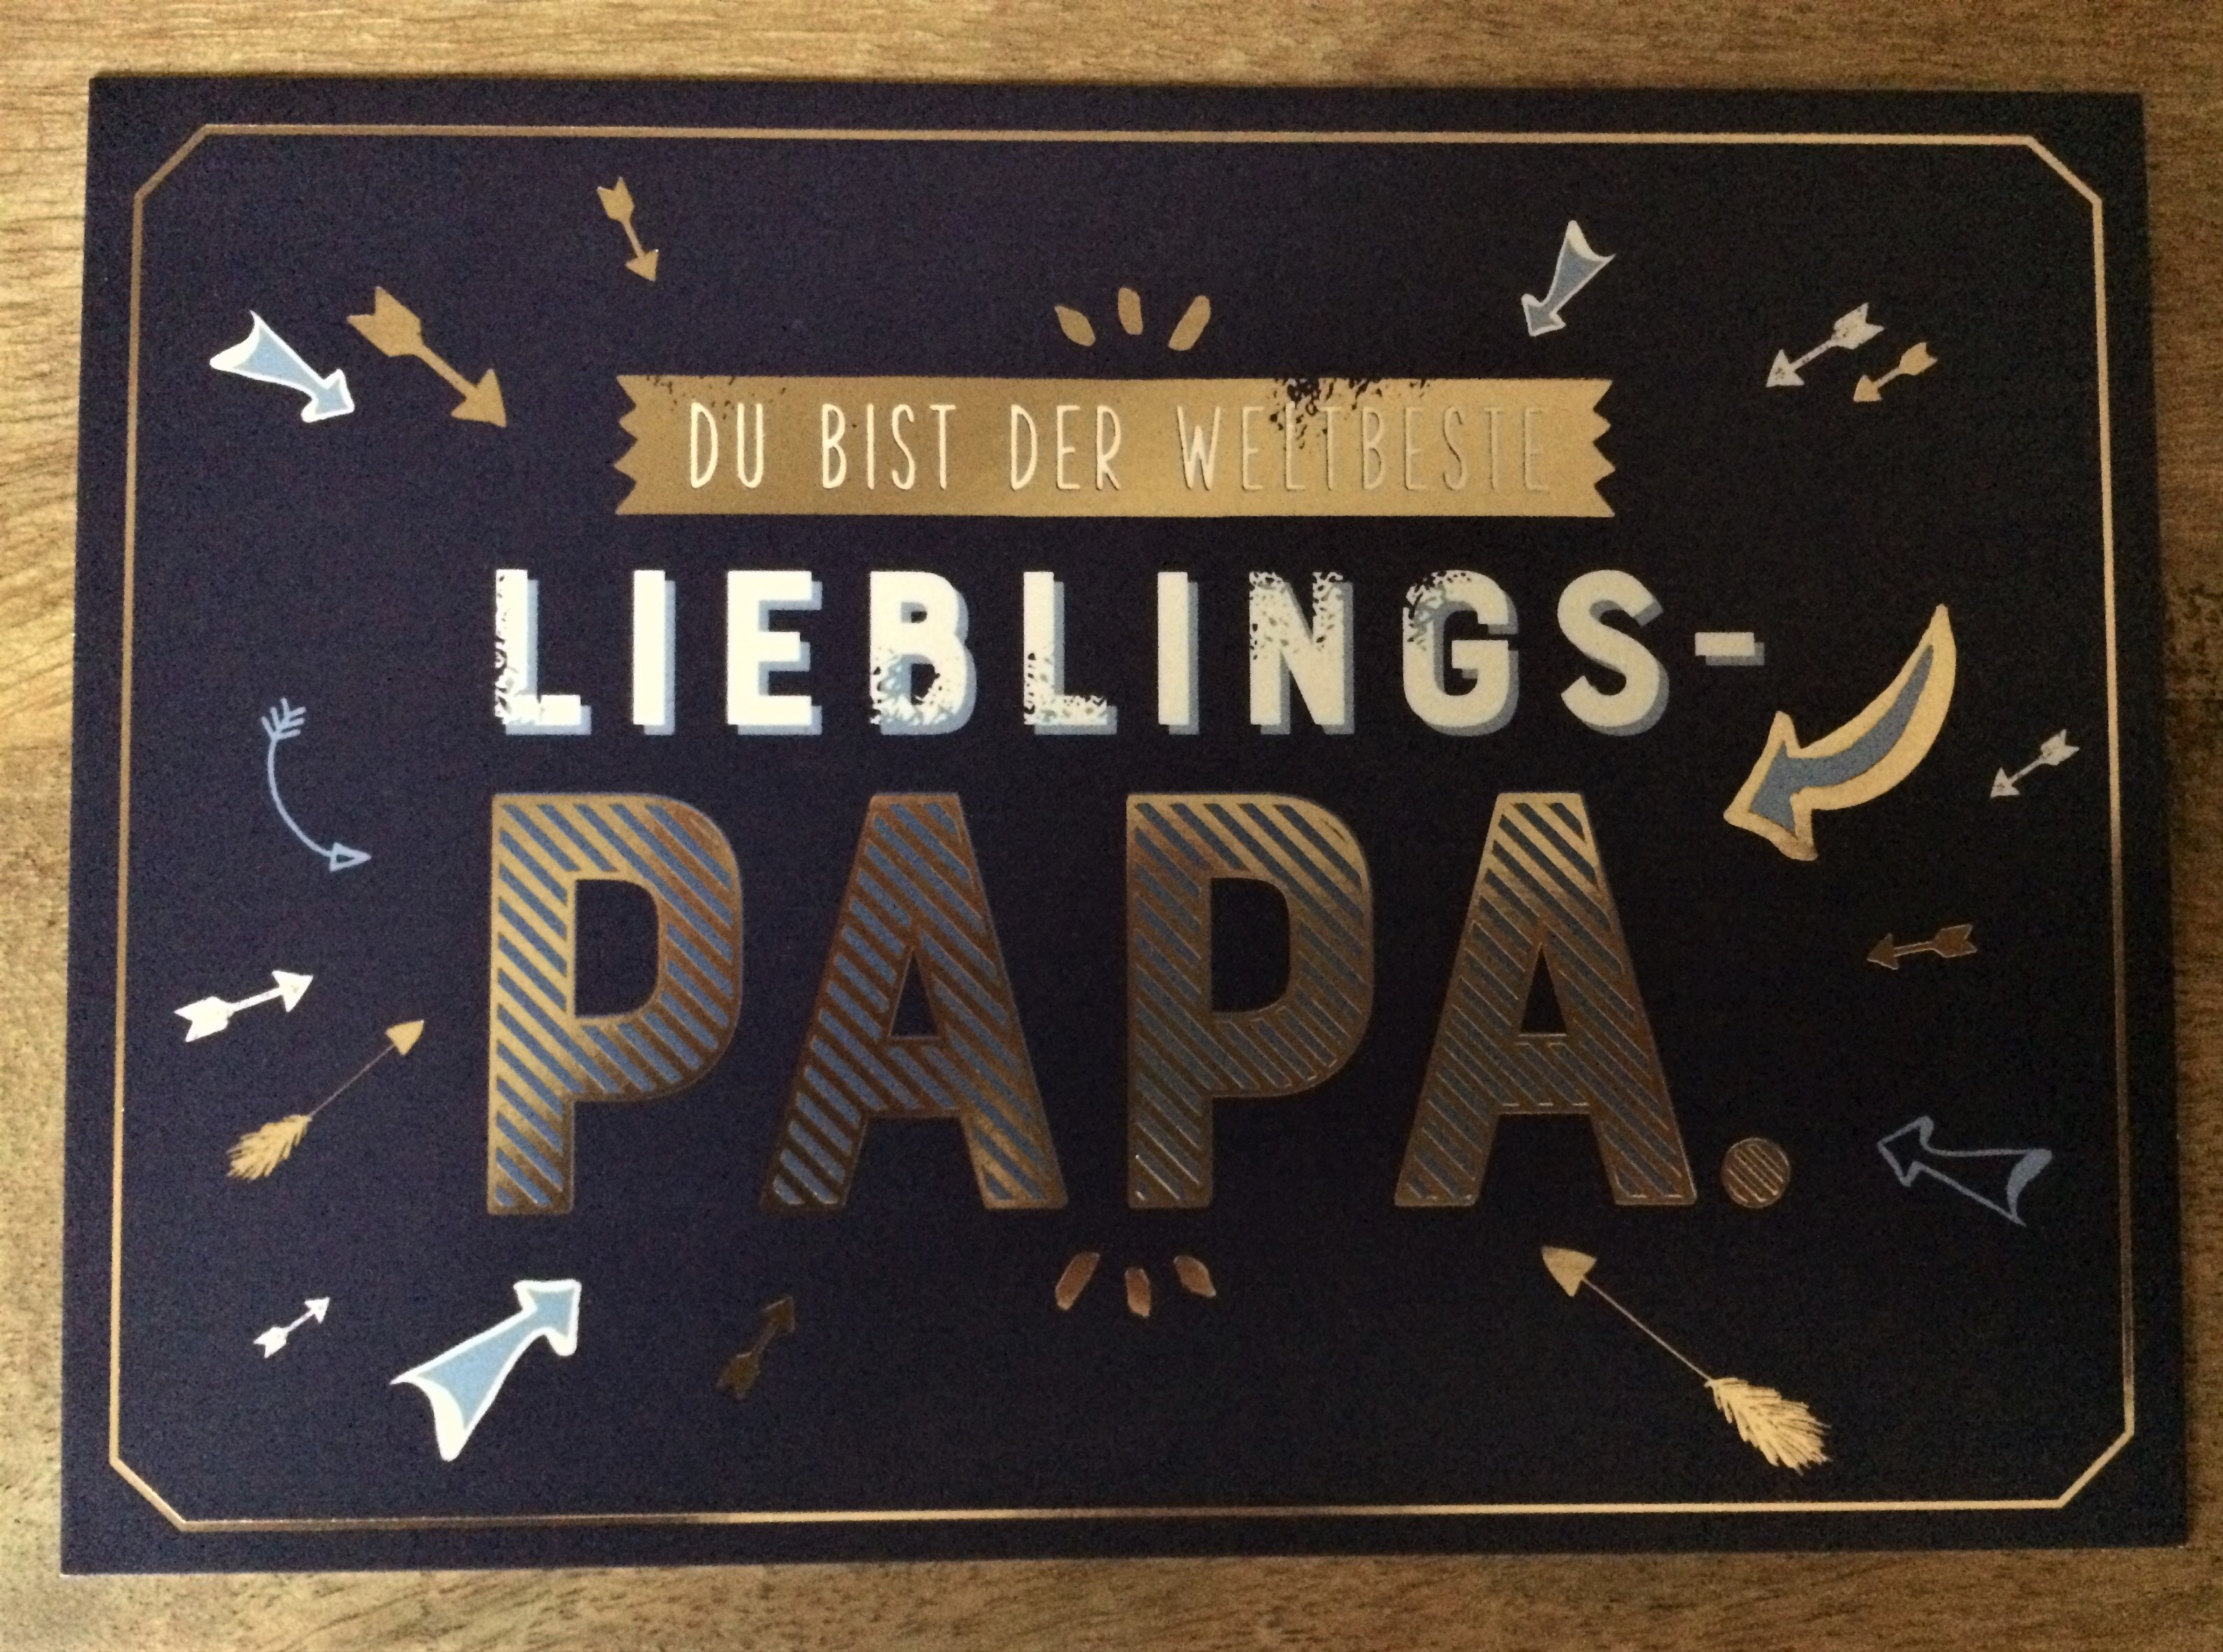 Nützlichgrusskarten - Postkarte Du bist der weltbeste Lieblings Papa - Onlineshop Tante Emmer